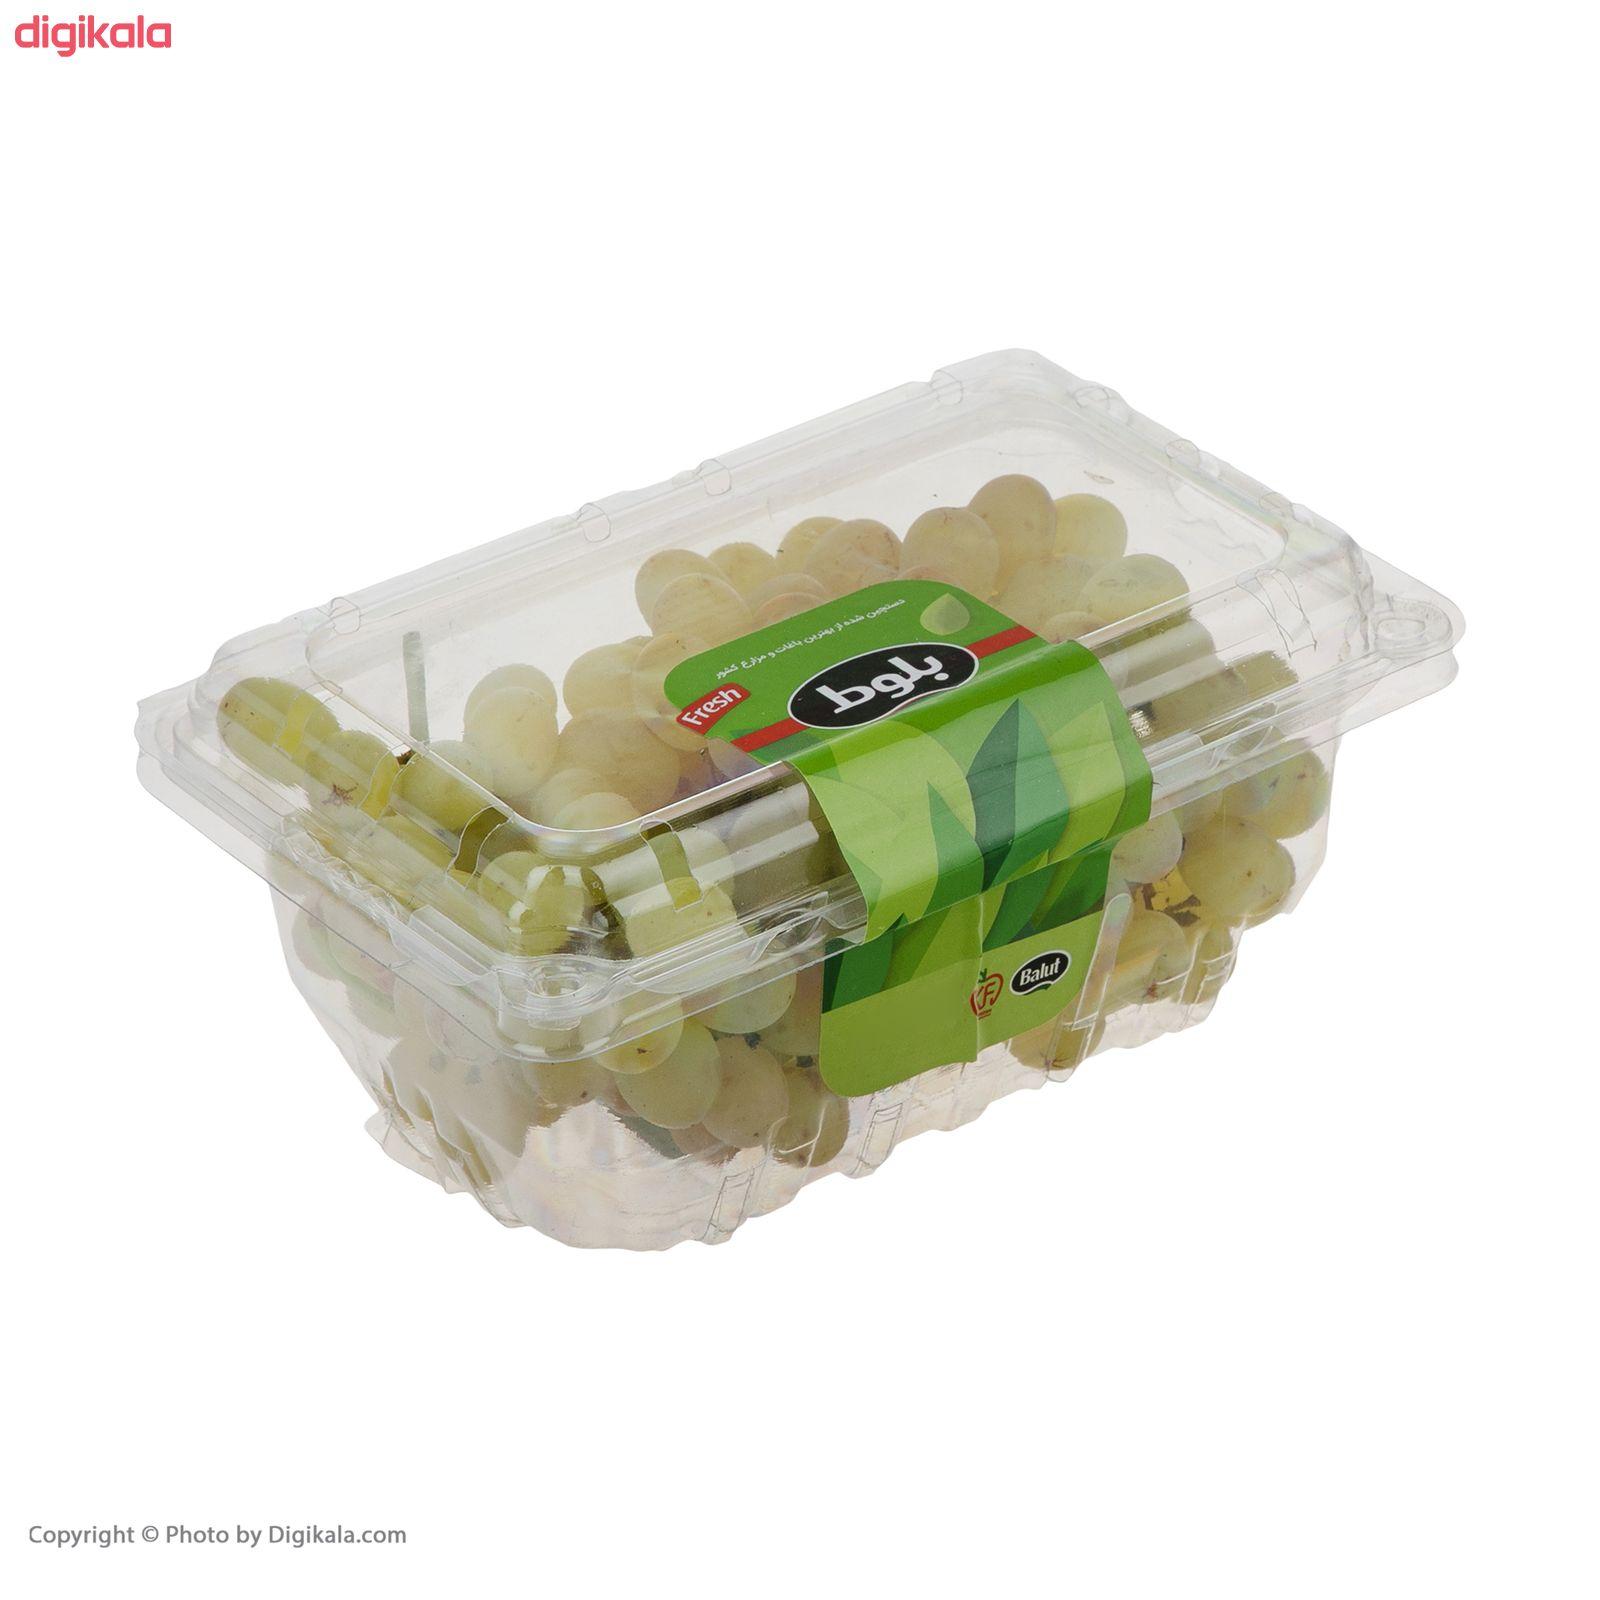 انگور بی دانه سفید بلوط - 500 گرم main 1 2